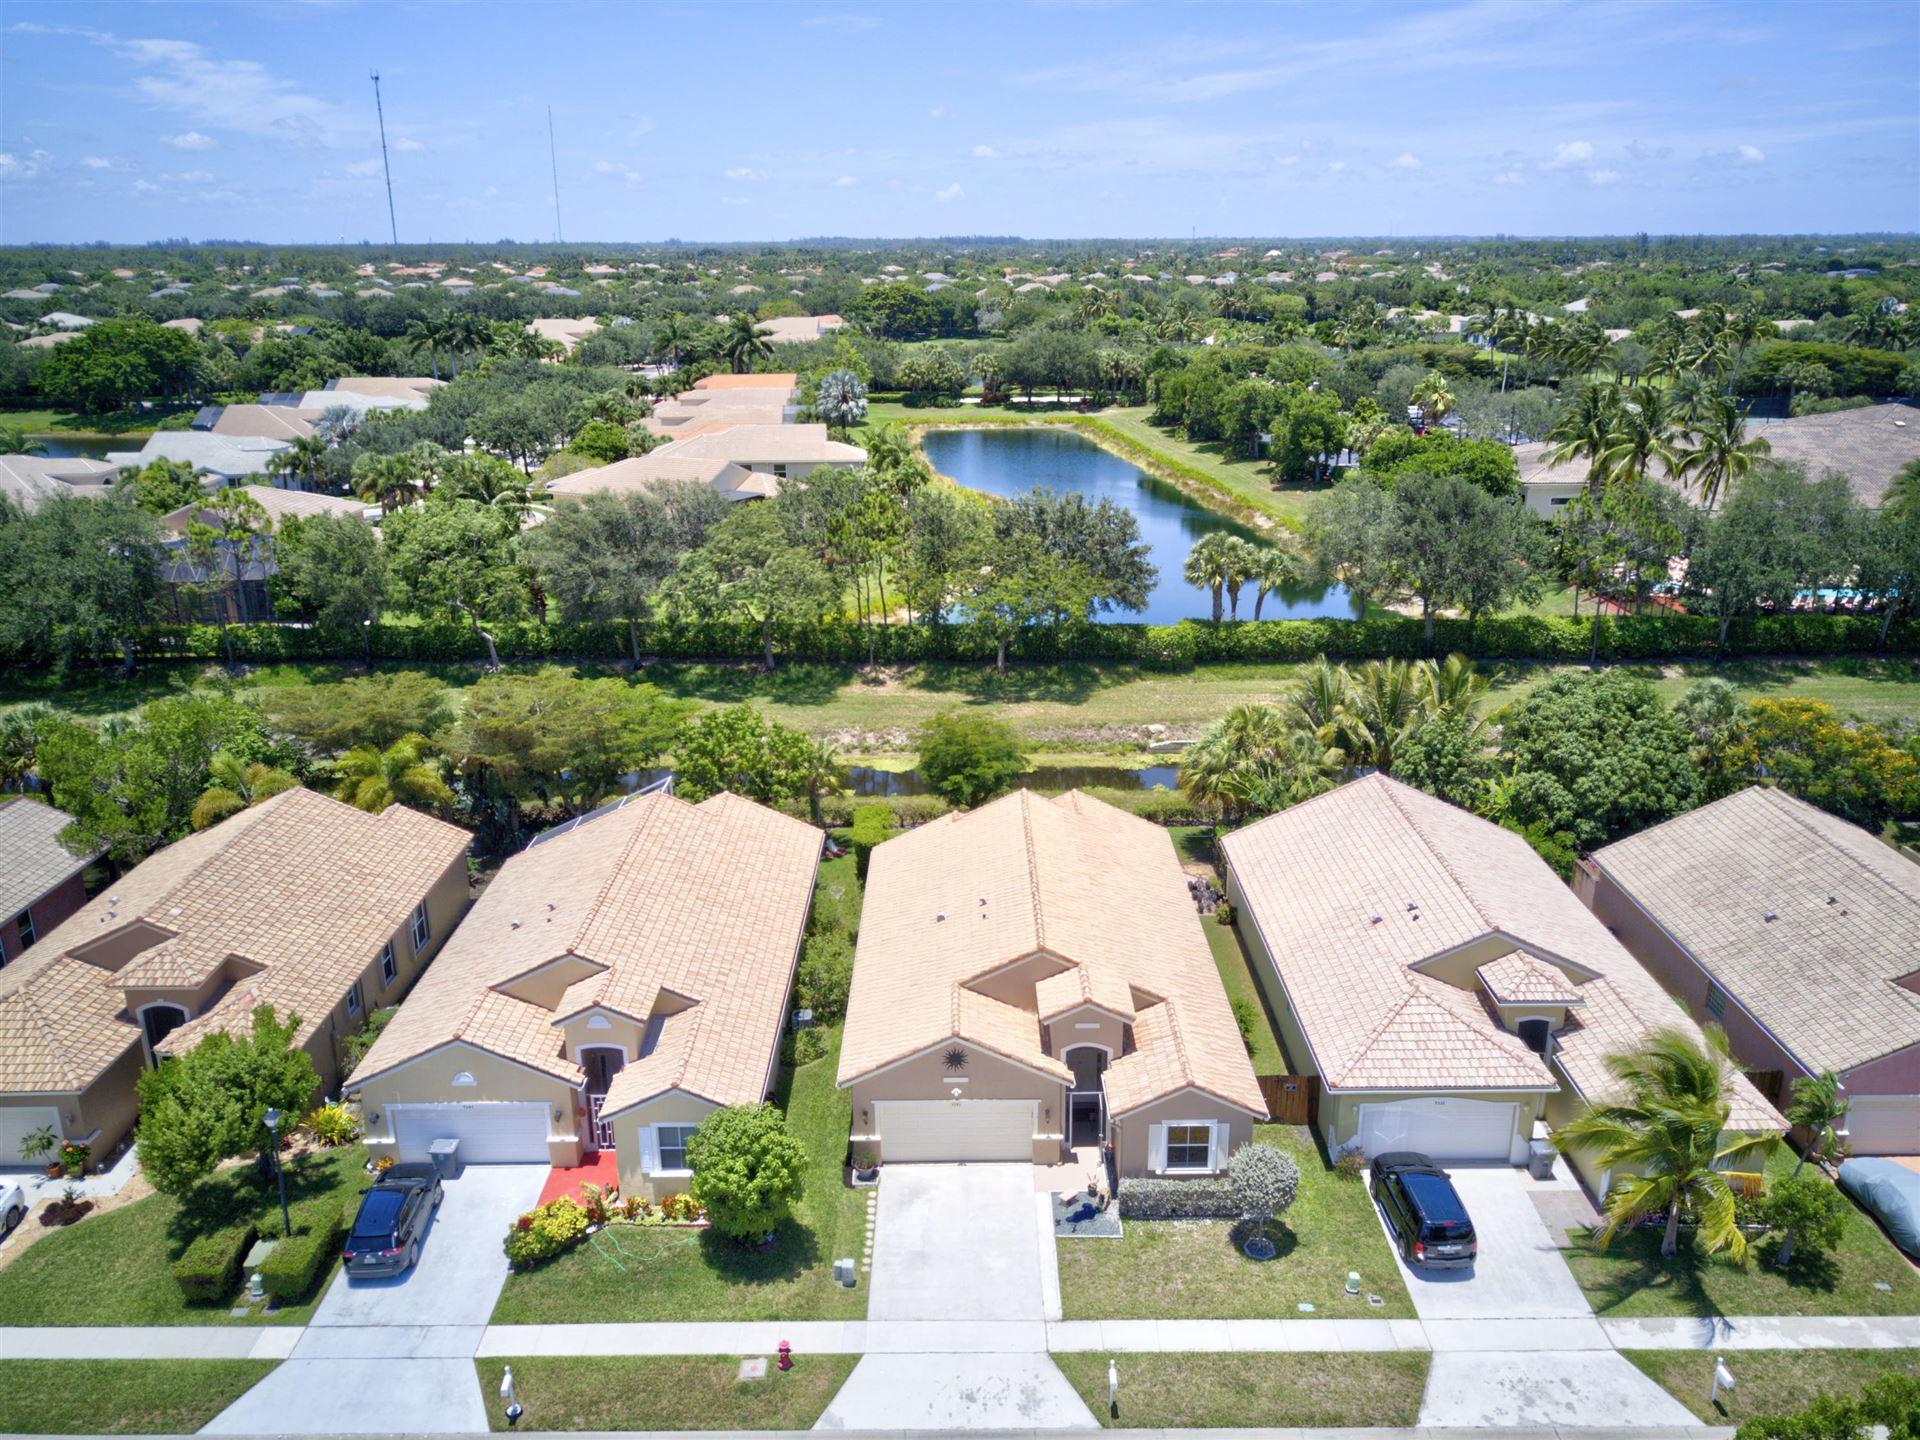 9541 Verona Lakes Boulevard, Boynton Beach, FL 33472 - MLS#: RX-10722634